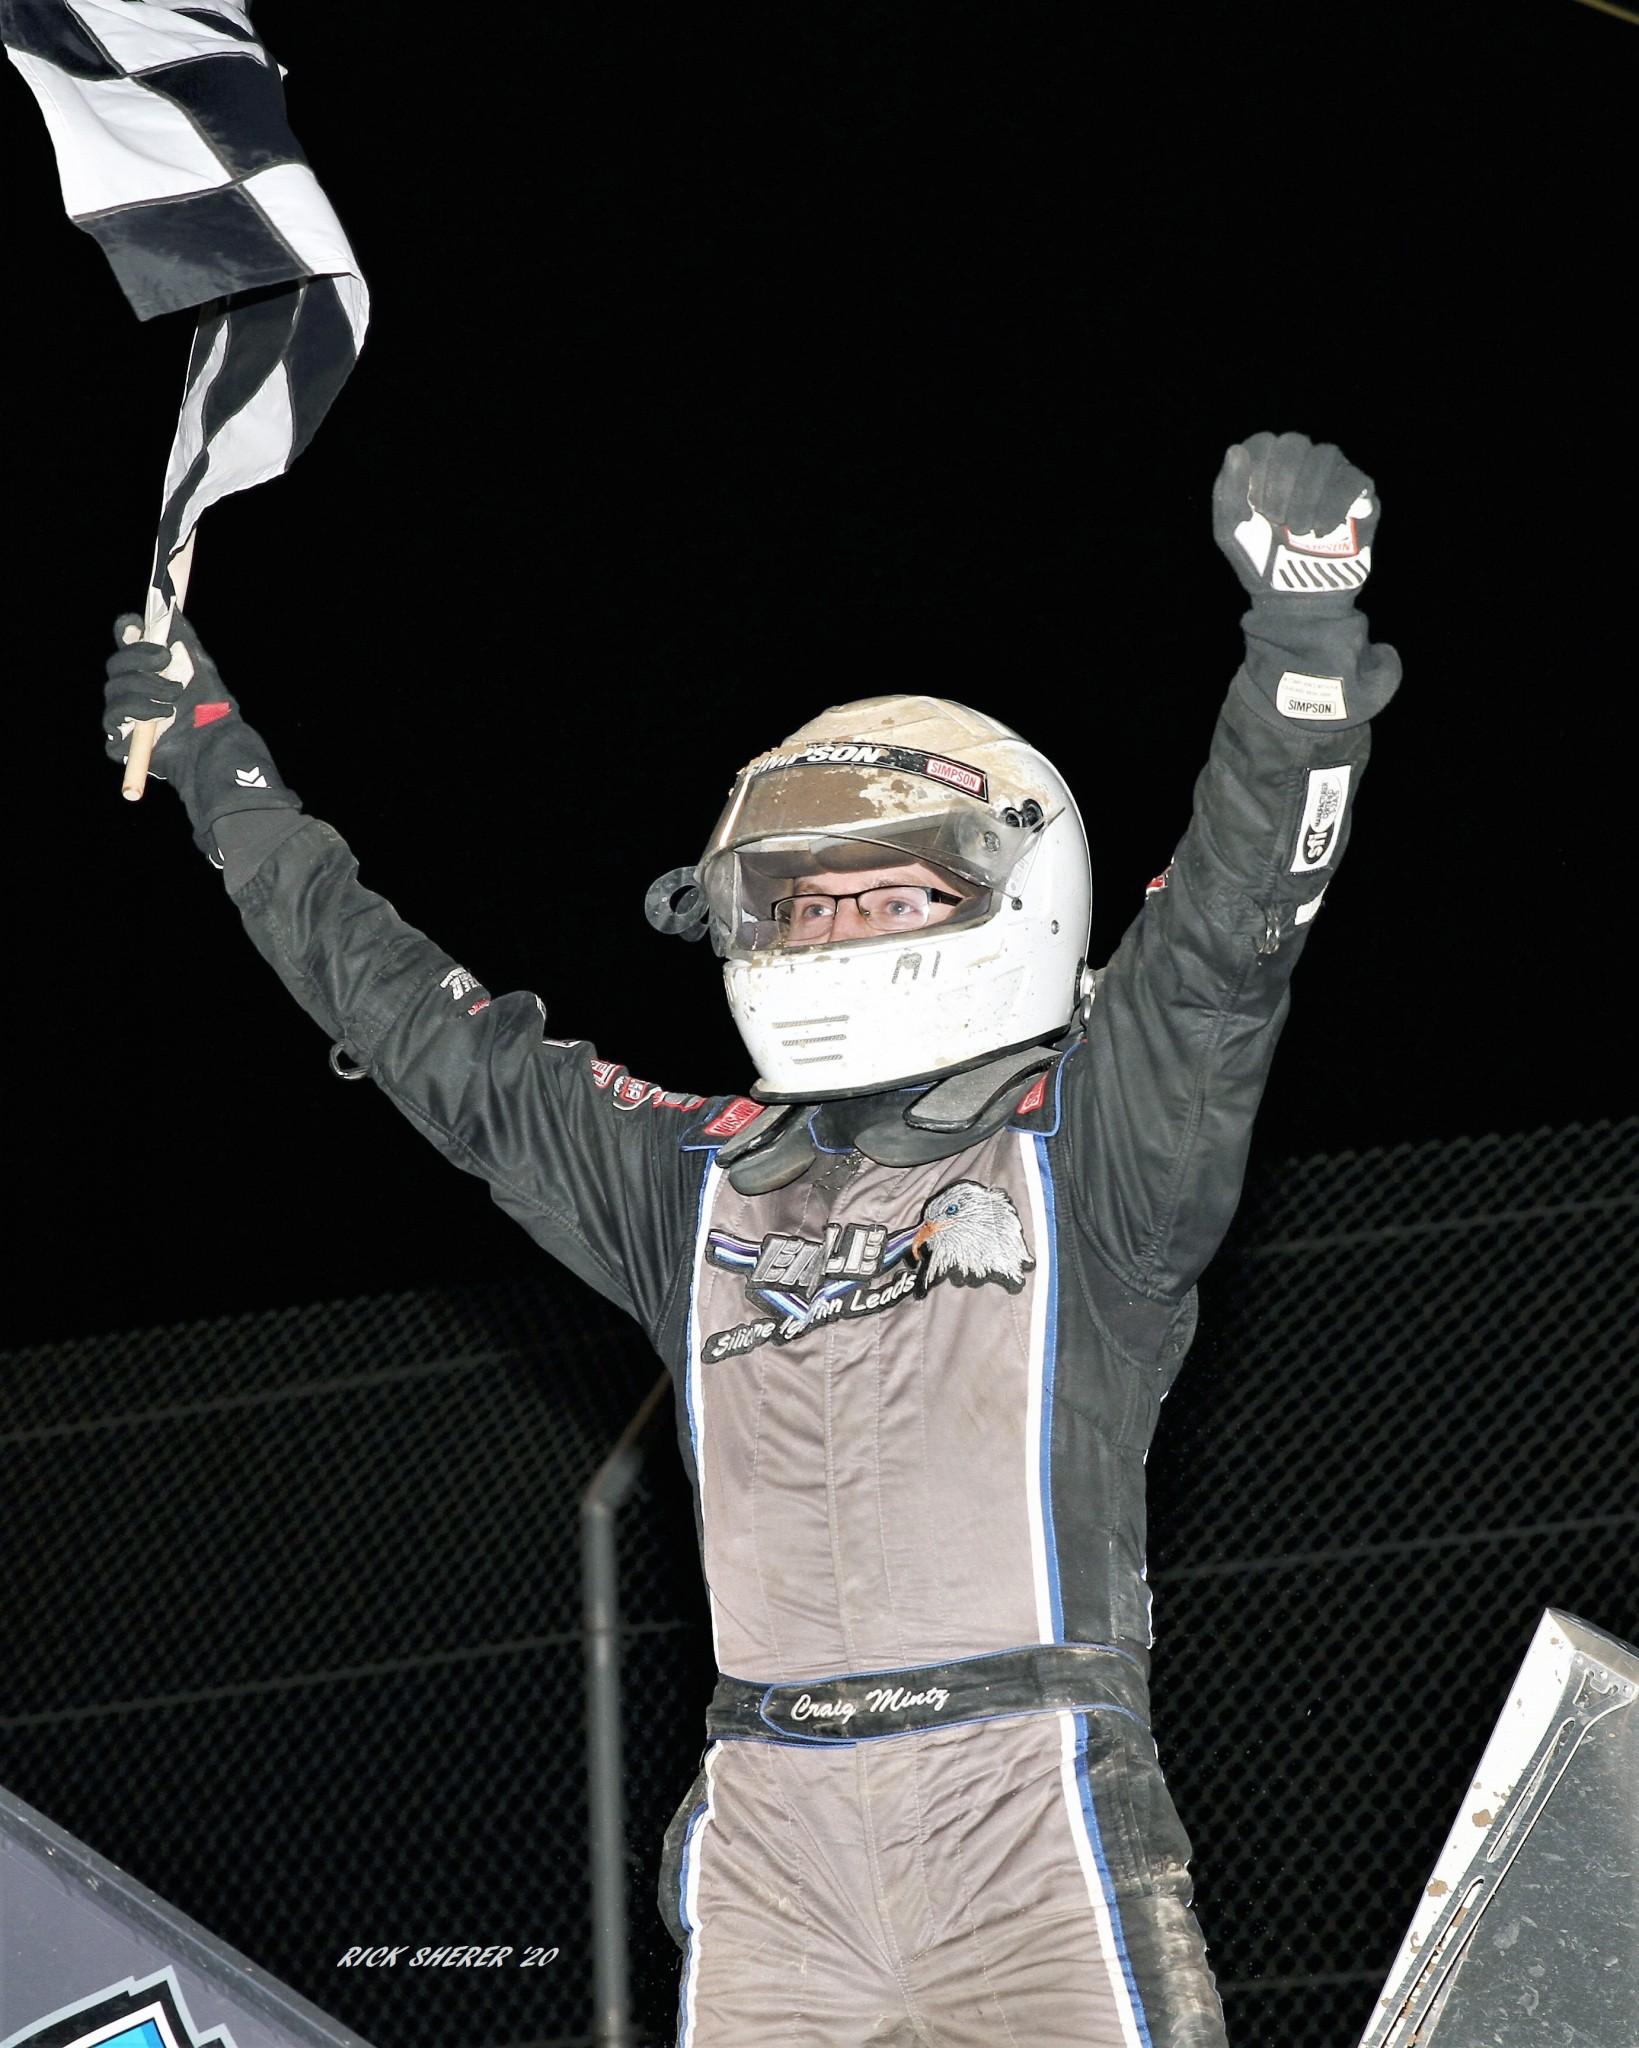 Gibsonburg driver Craig Mintz. (Photo by Rick Sherer)